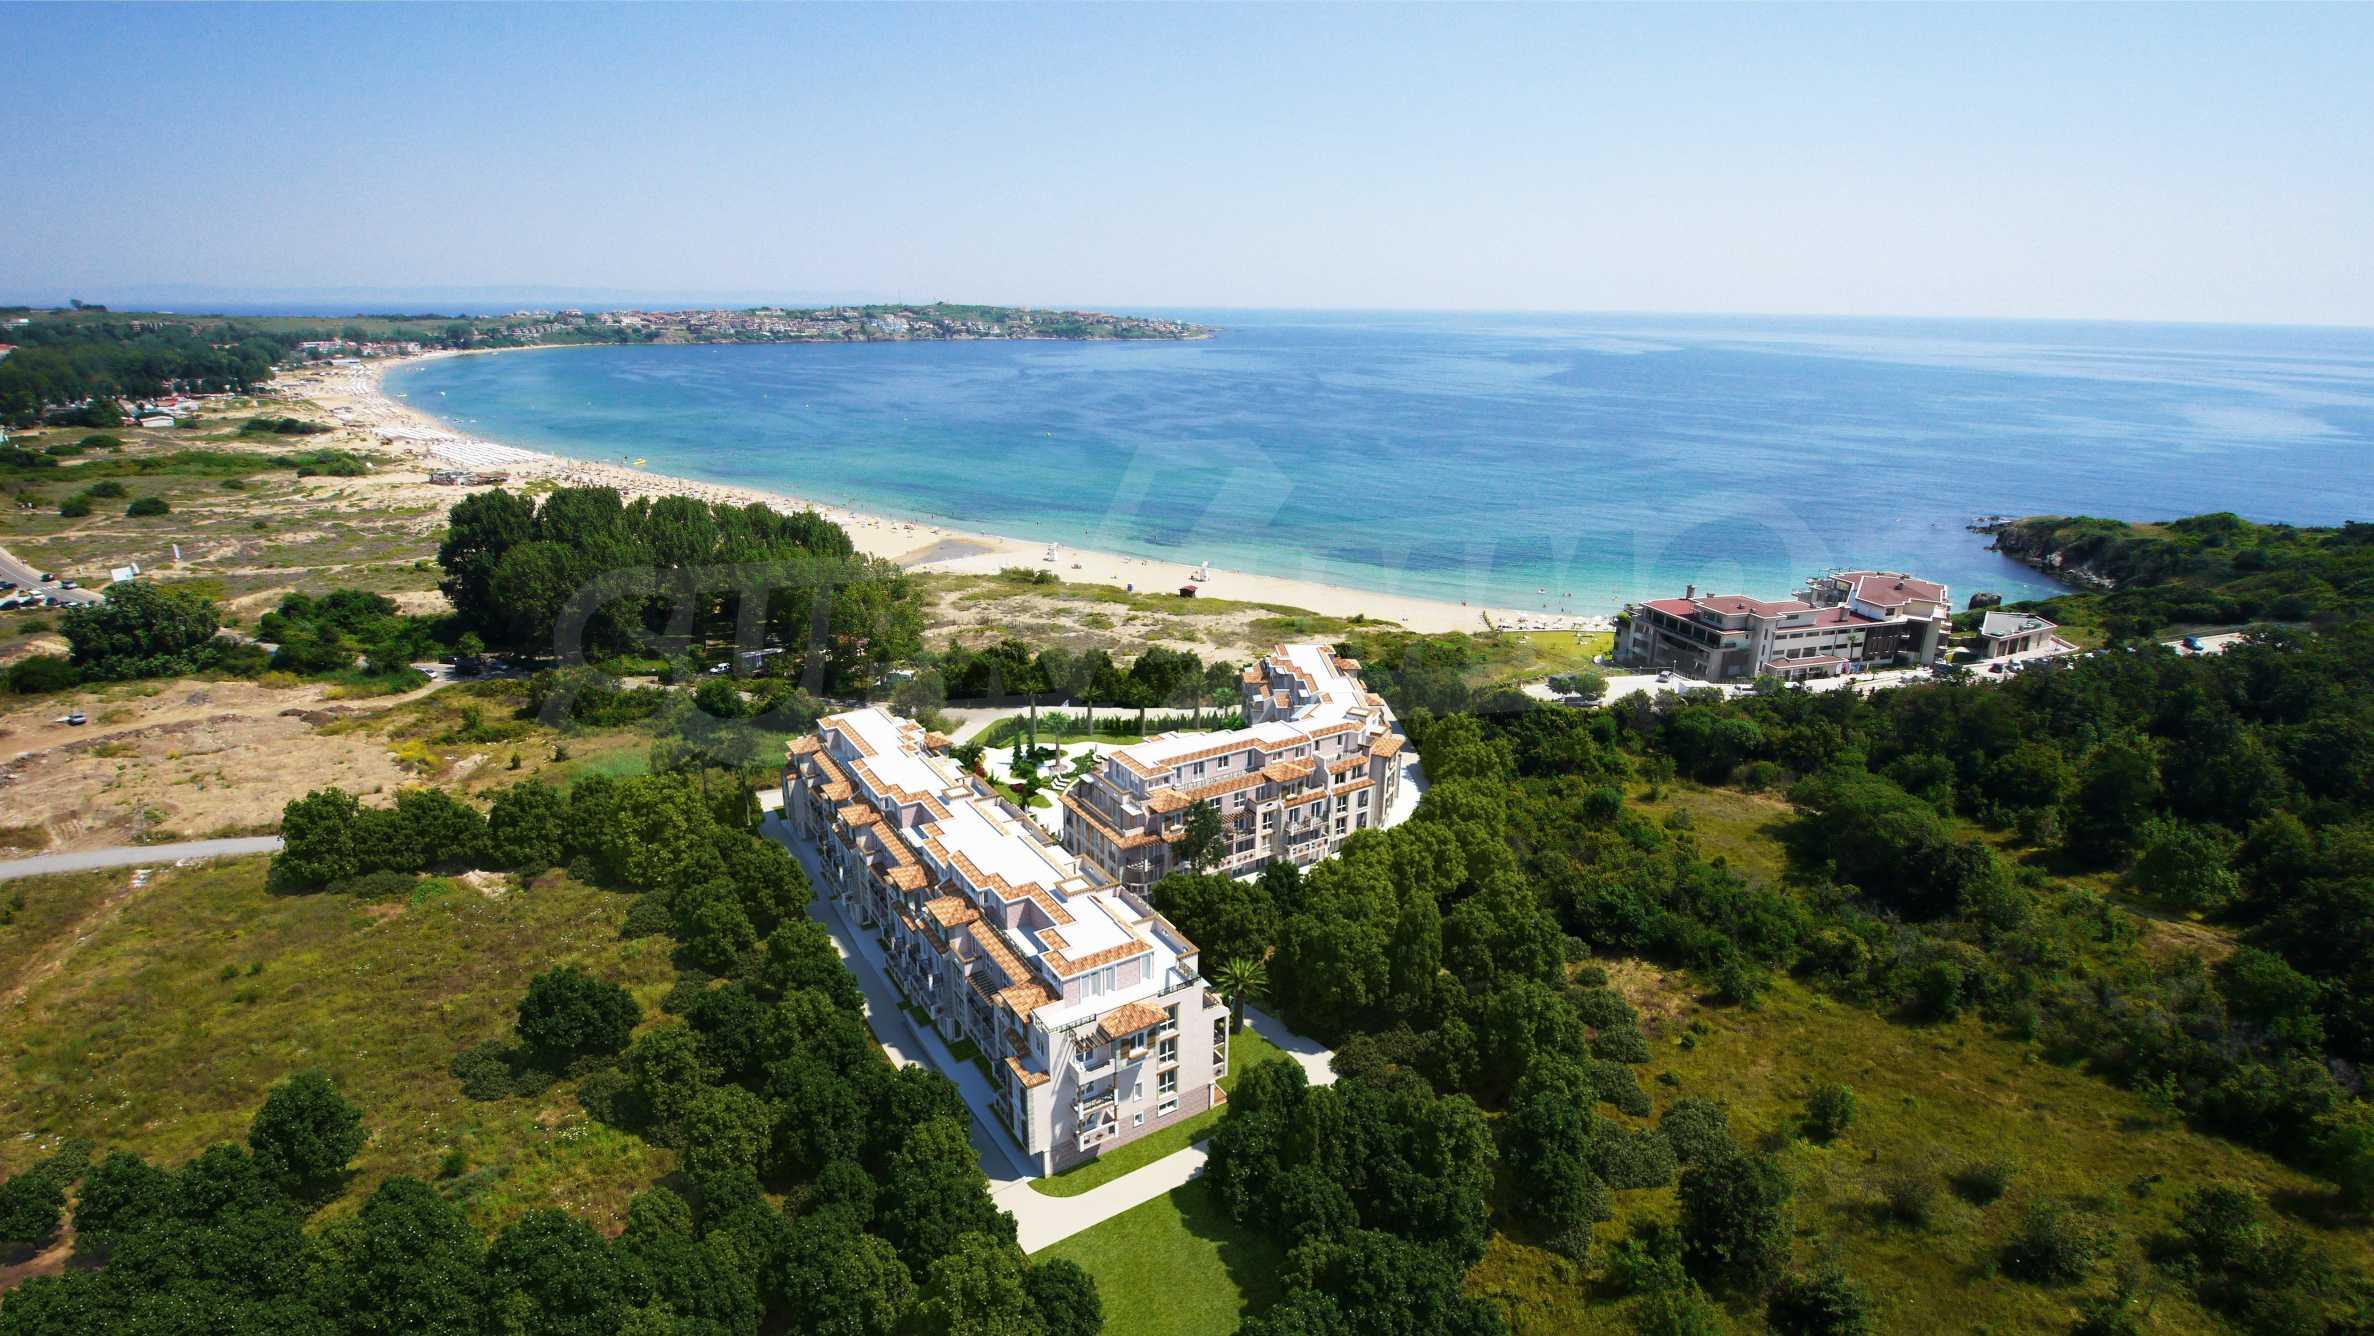 New 1-bedroom apartment in a coastal complex by the Kavatsite Beach (Sozopol) 3